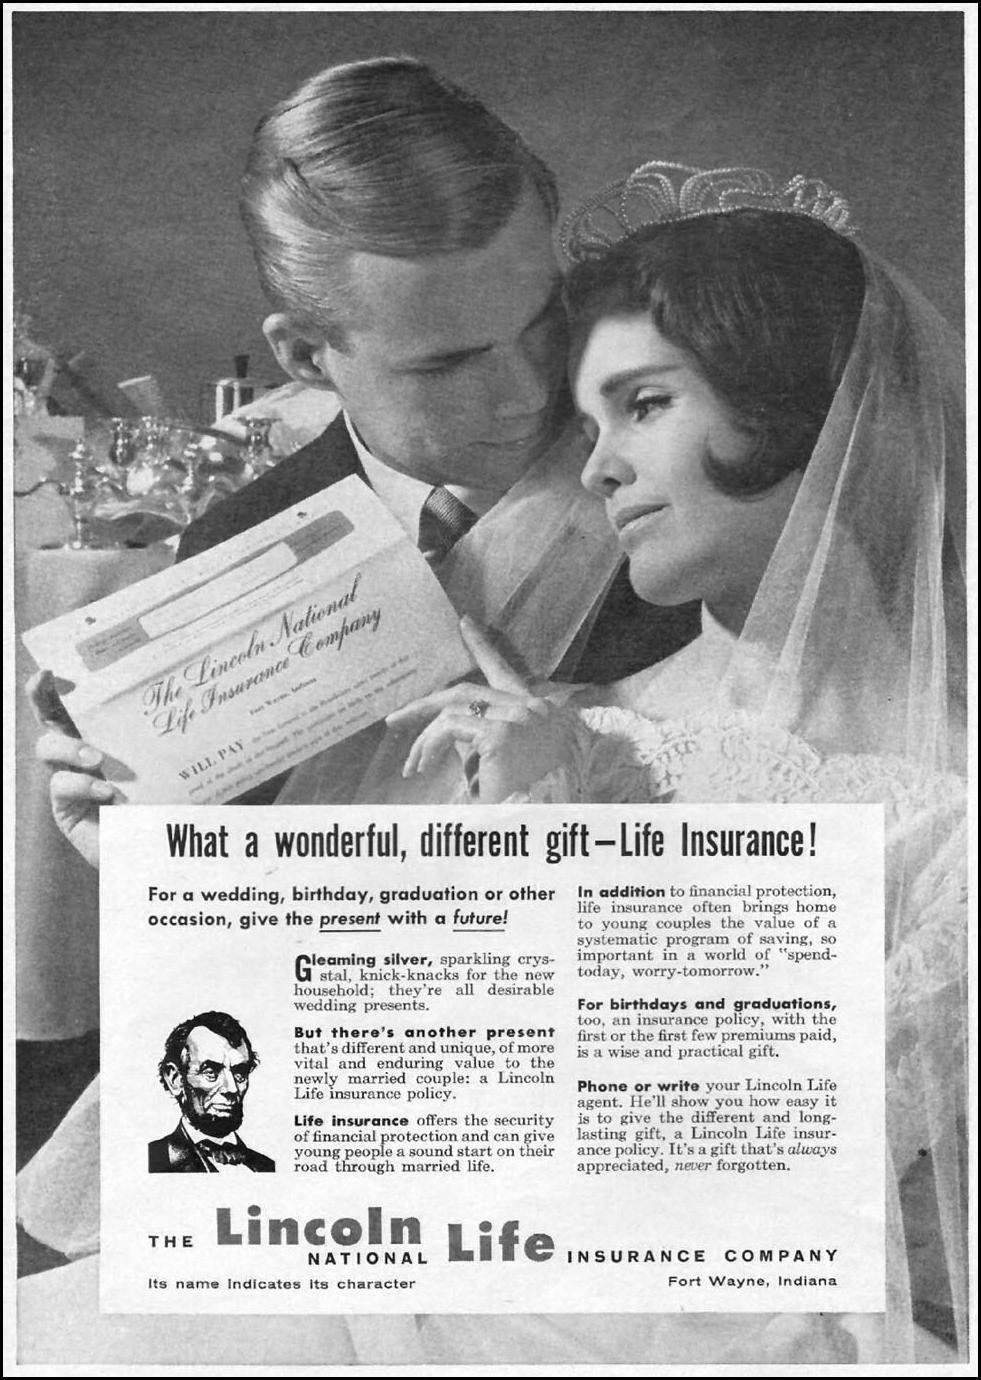 LIFE INSURANCE TIME 05/23/1963 p. 83